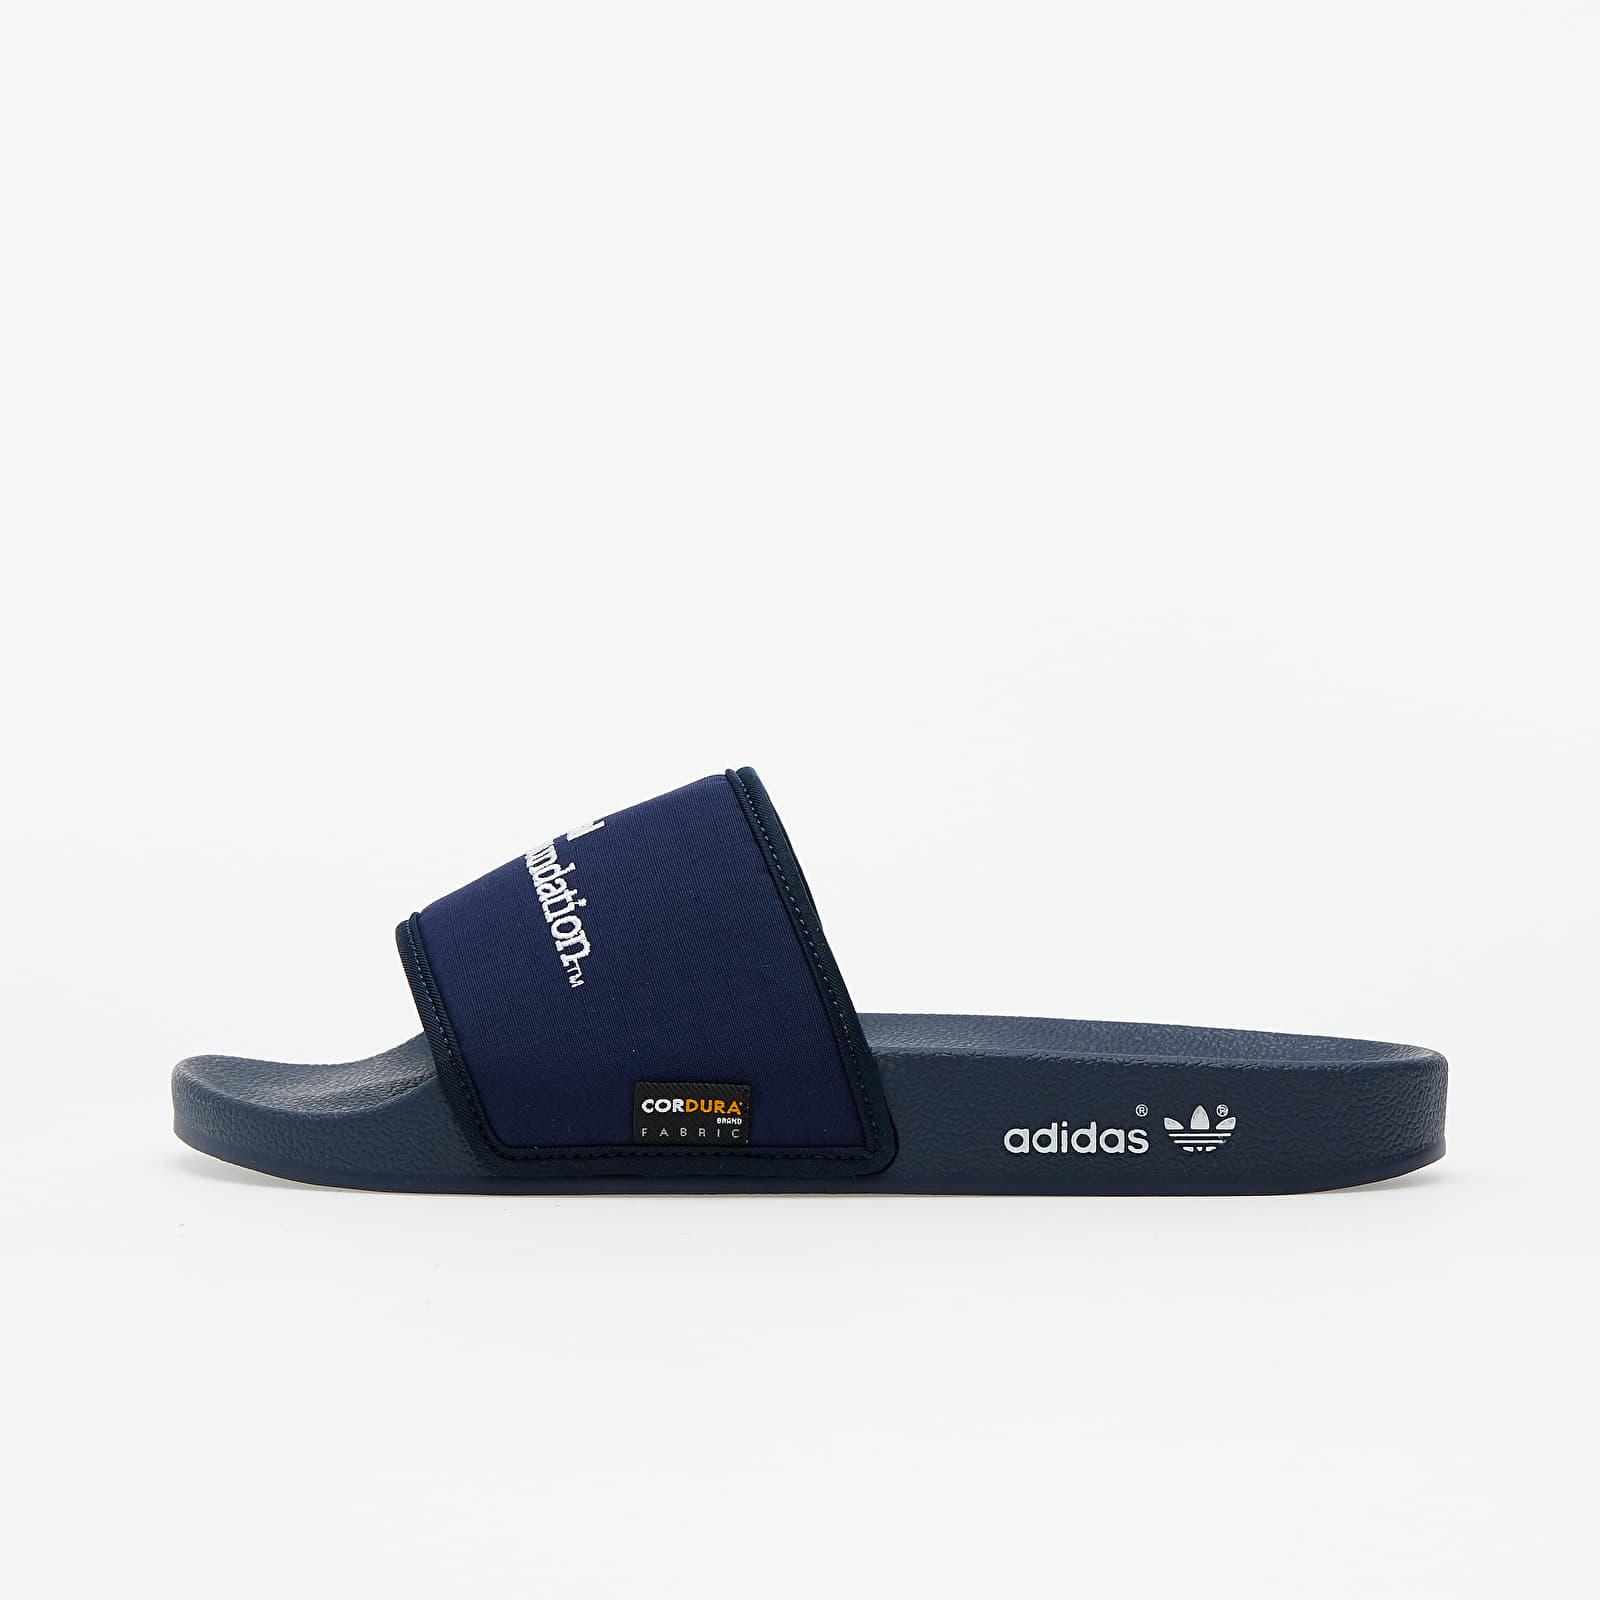 adidas Adilette Collegiate Navy/ Ftwr White/ Collegiate Navy EUR 38